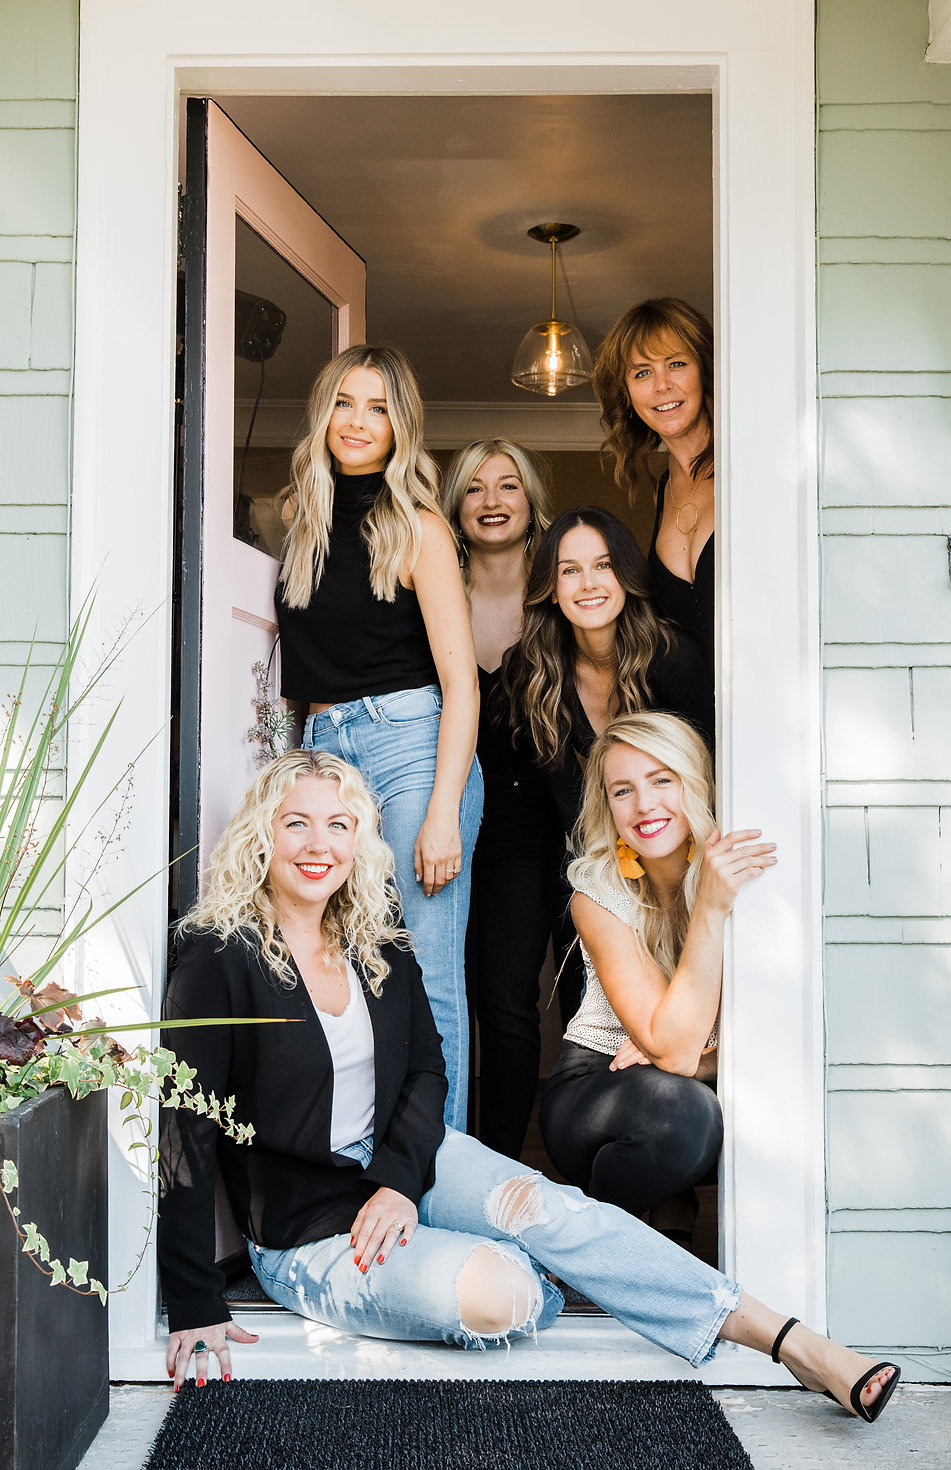 The team of professional stylist at La Vie Salon West Seattle